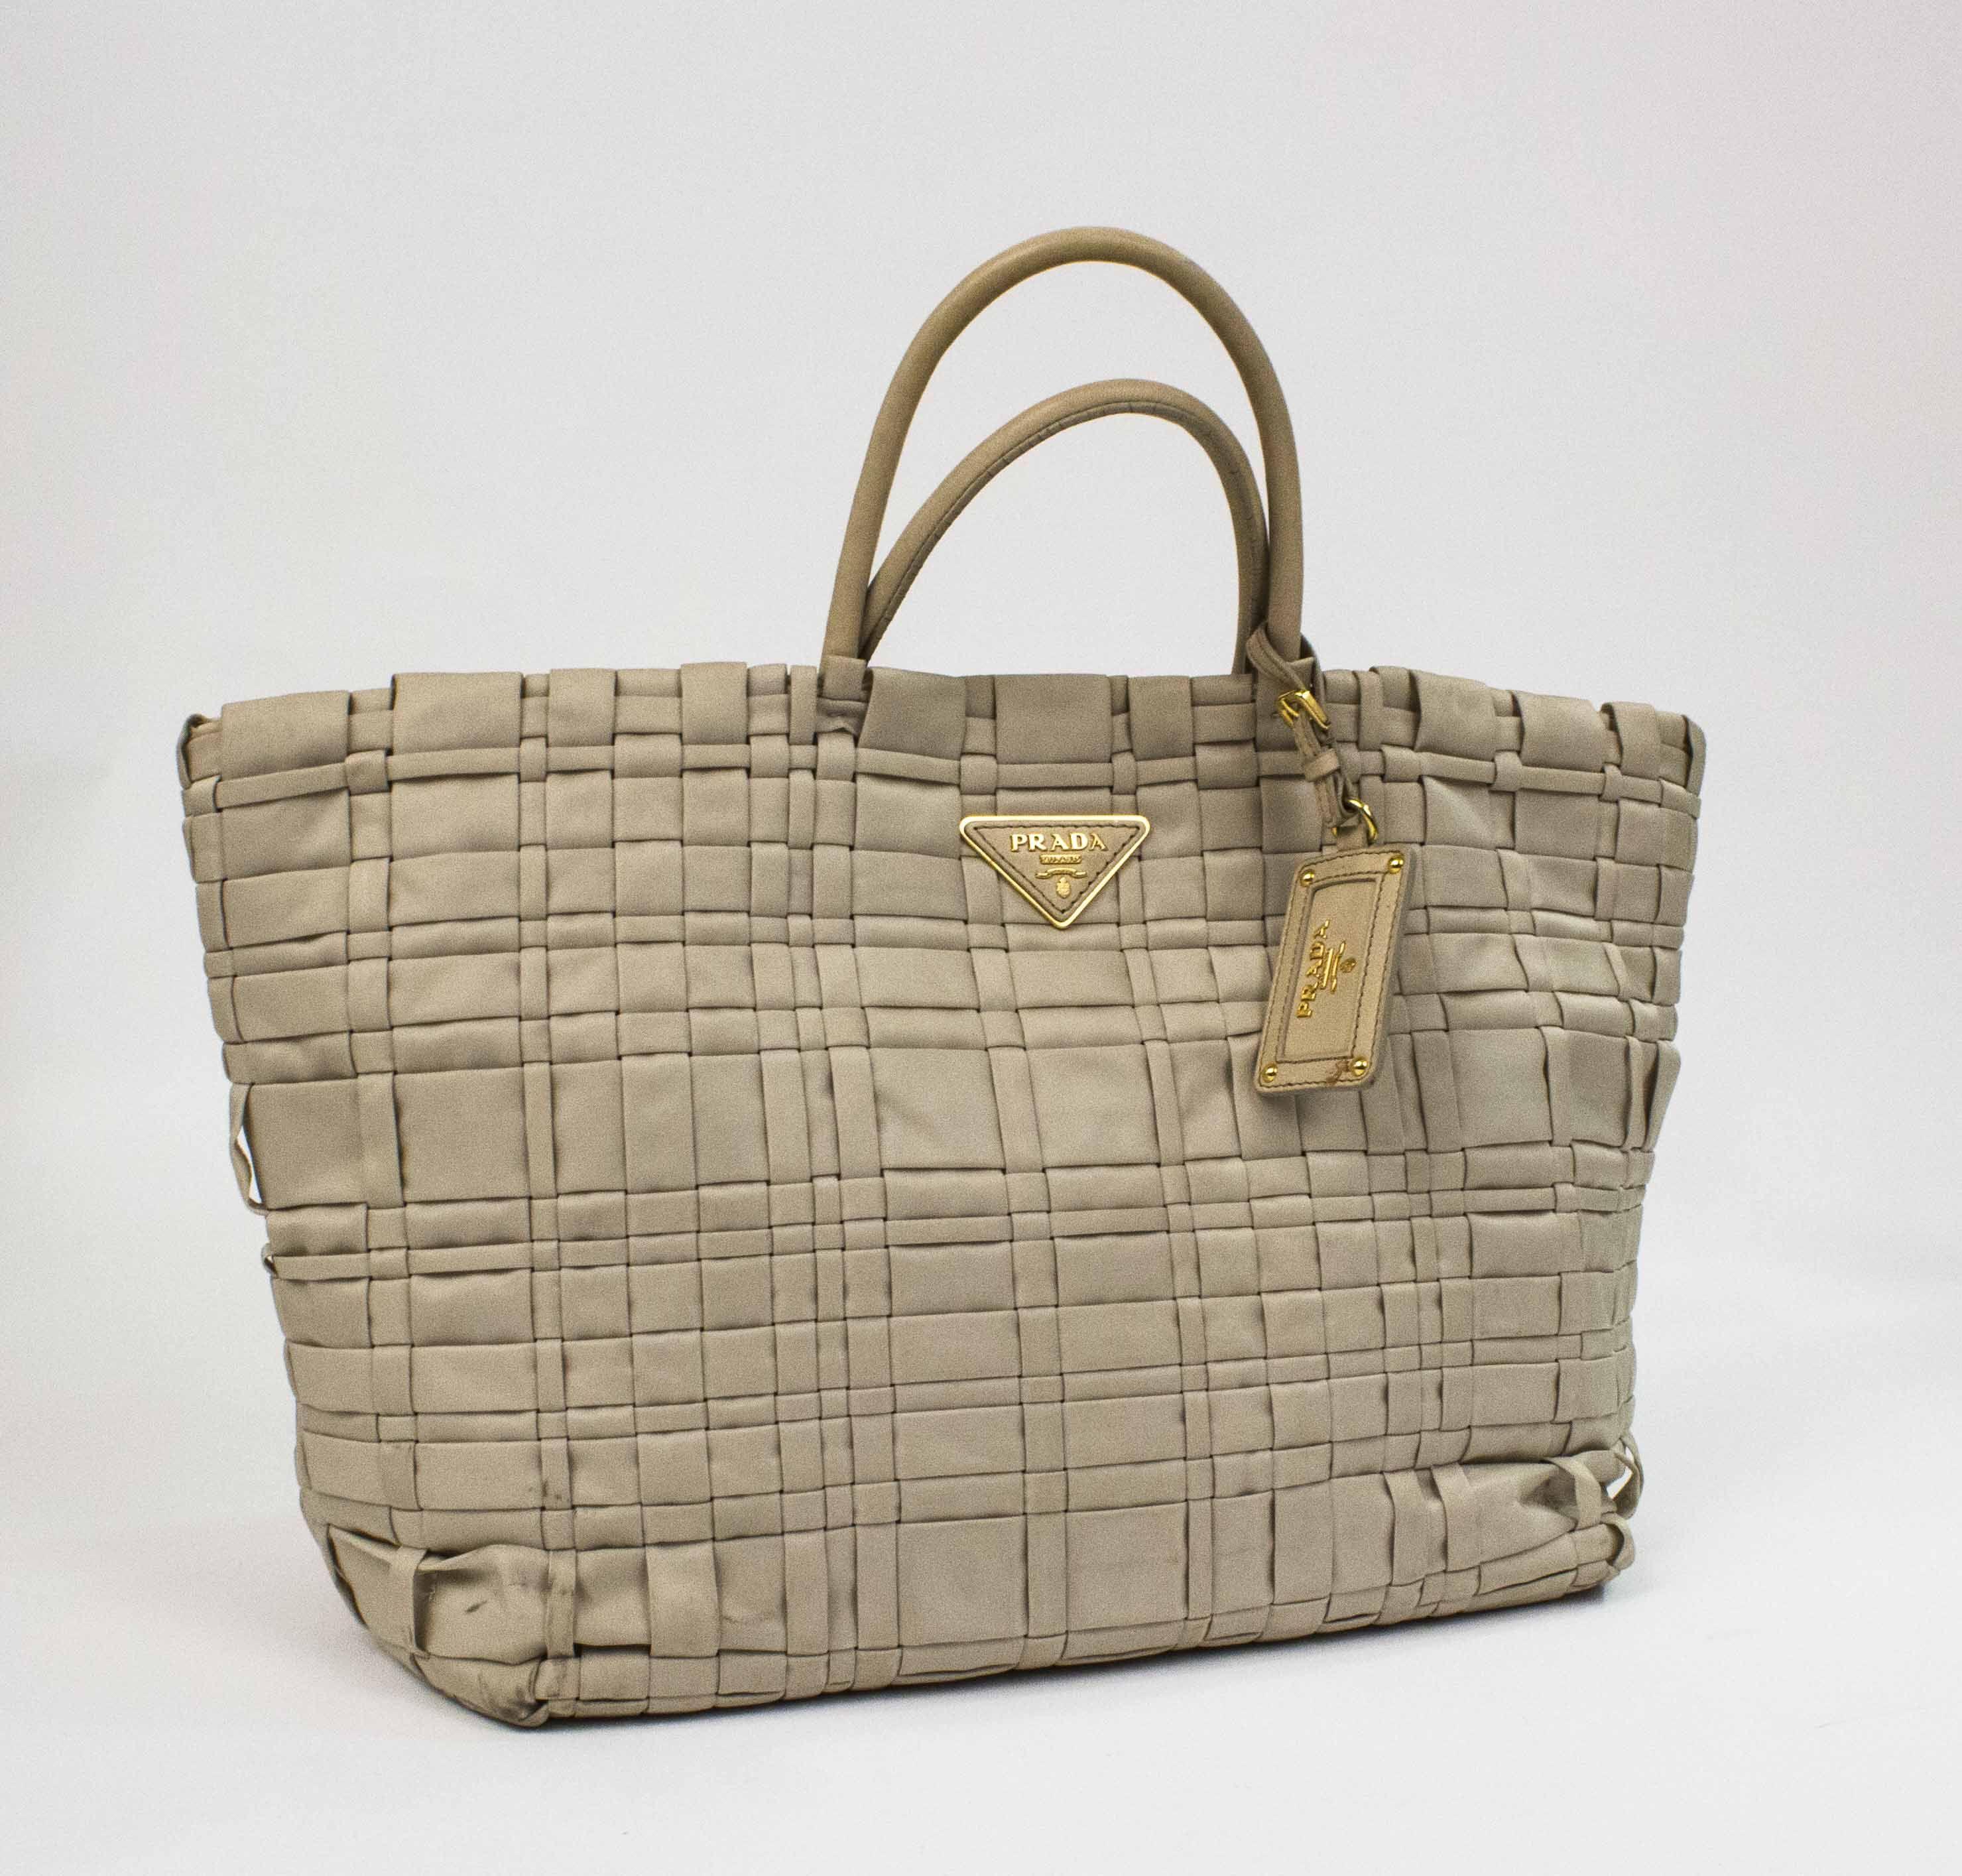 f154609fa4de ... 50% off prada beige tessuto weave tote. pandora price 249 96f4c f9b8d